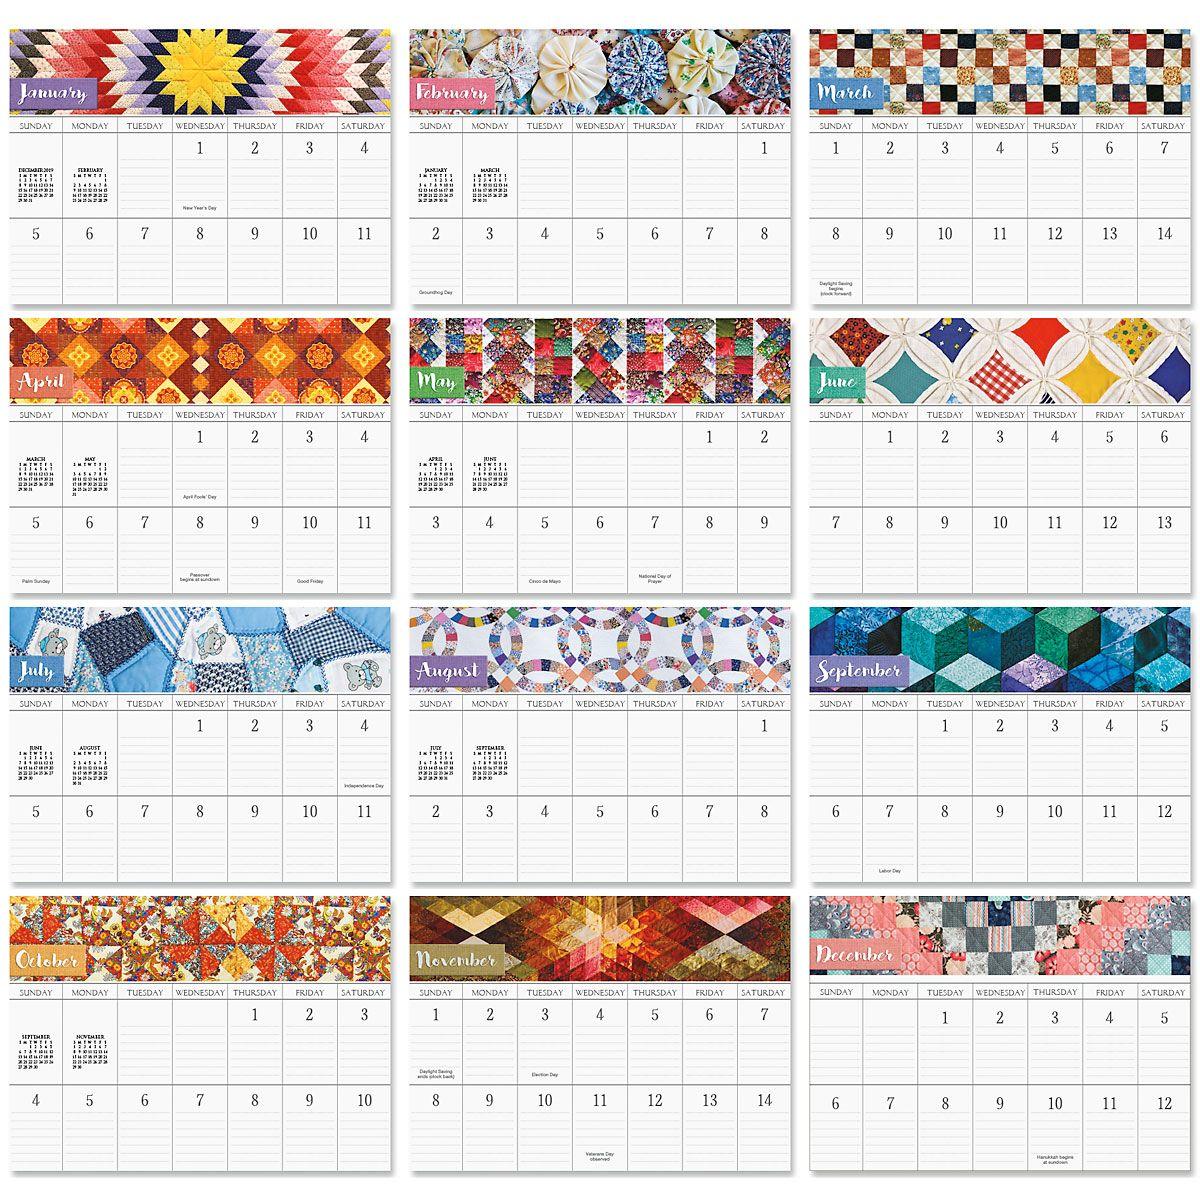 2020 Patchwork Memories Big Grid Planning Calendar with Pockets